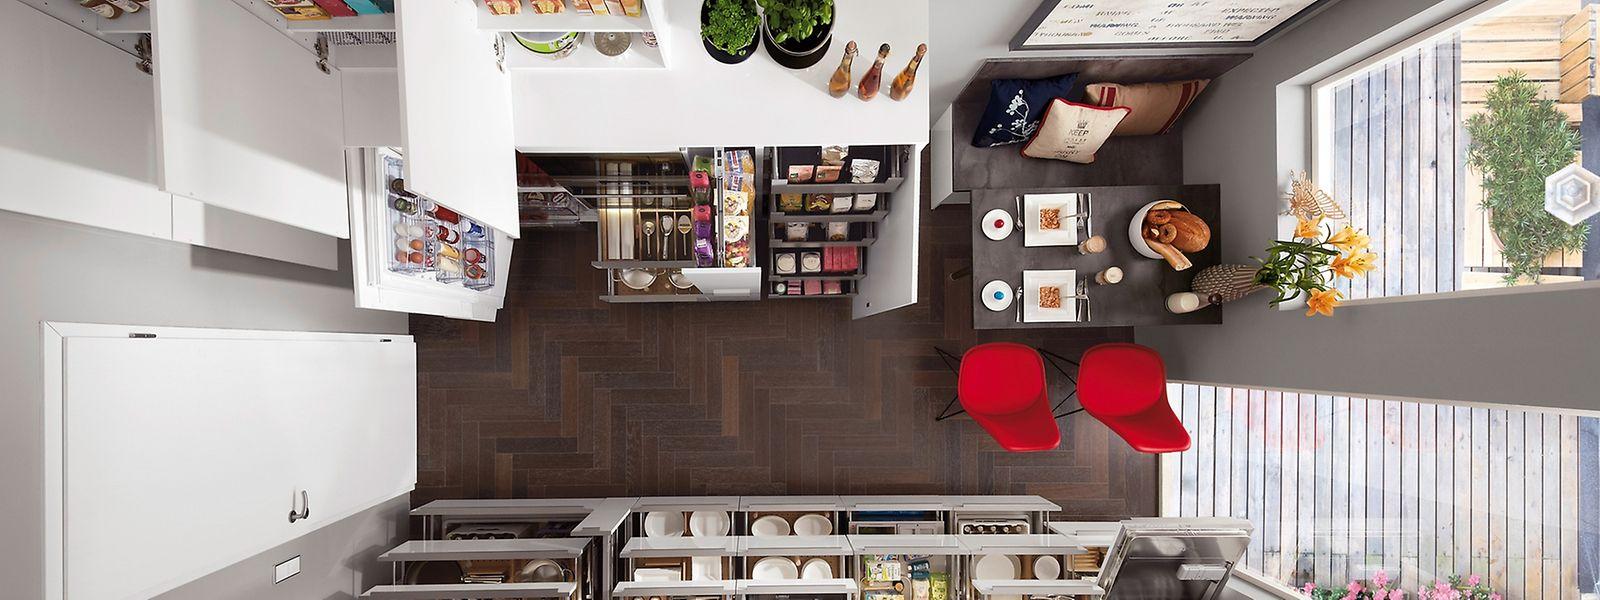 Berühmt Schubladenausziehführung Platzierung Küche Galerie - Ideen ...